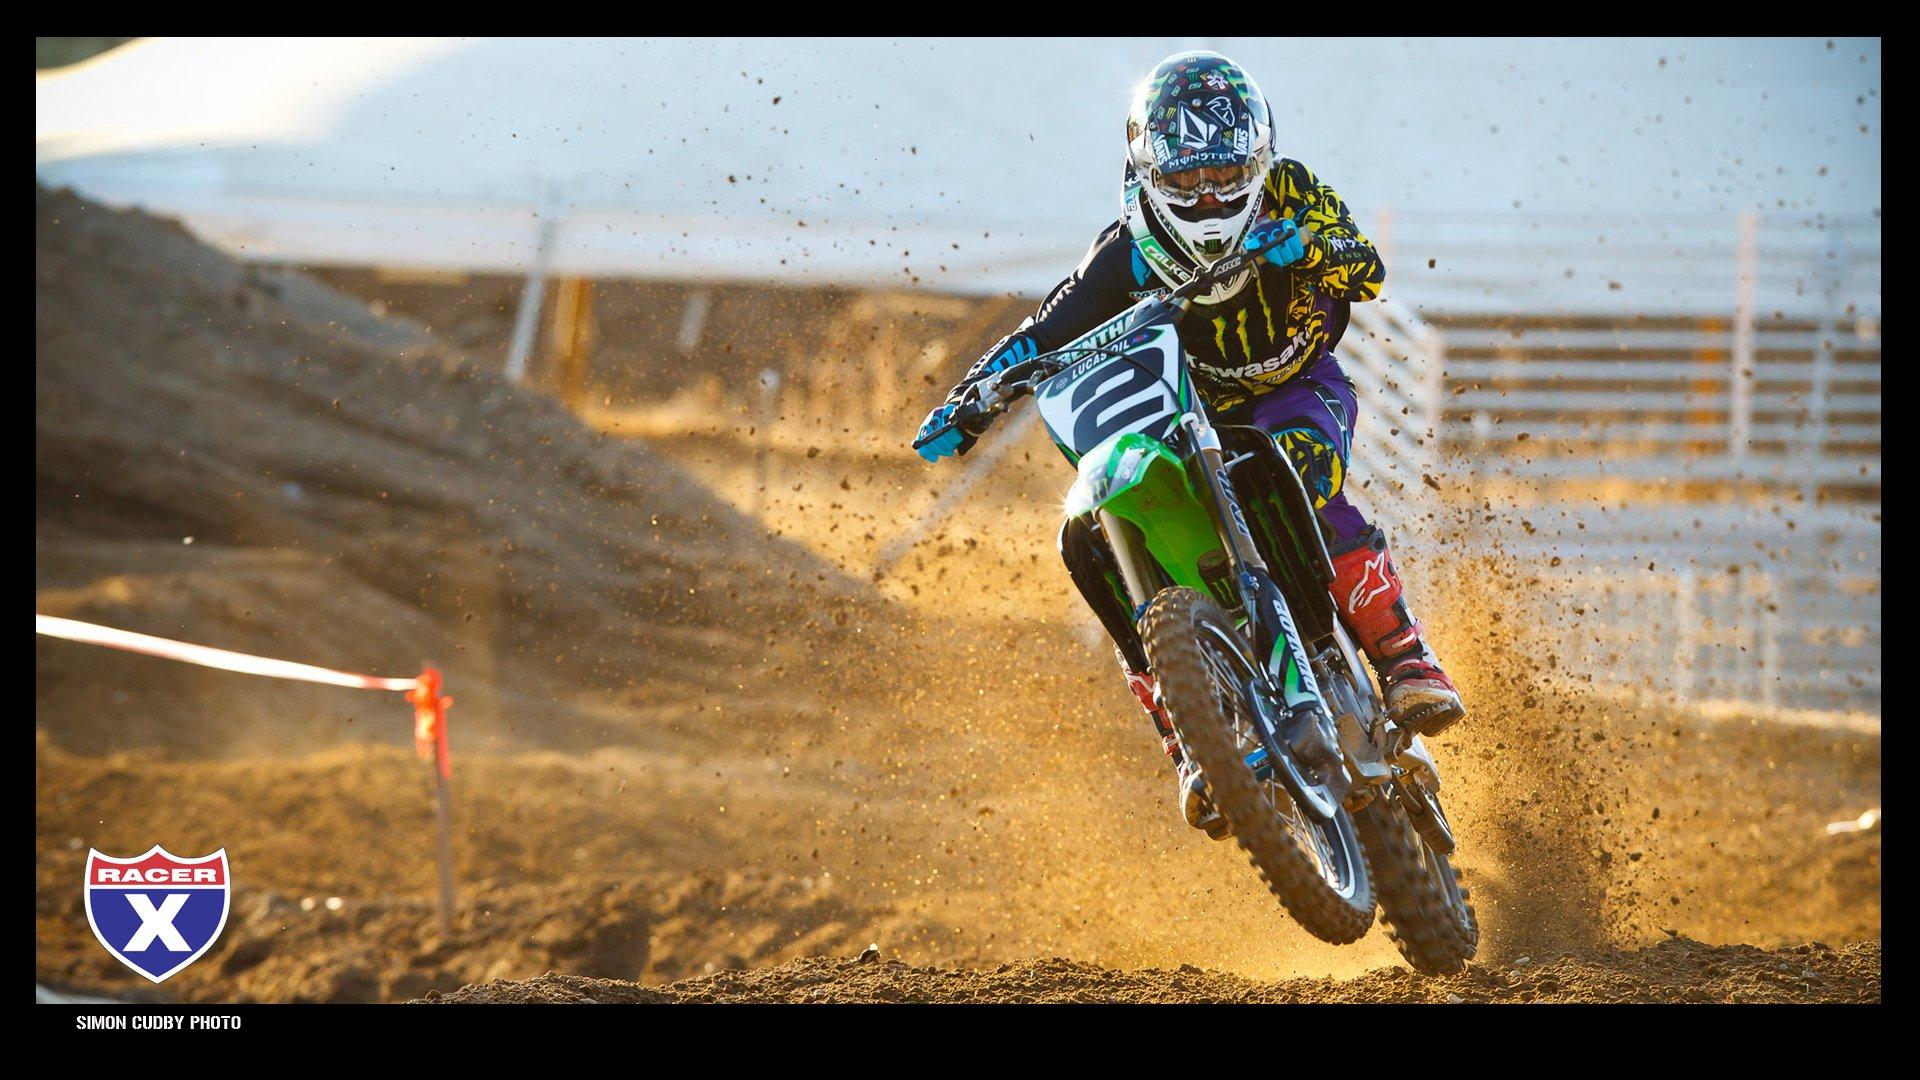 Wednesday Wallpaper Ryan Villopoto   Racer X 1692483   HD 1920x1080